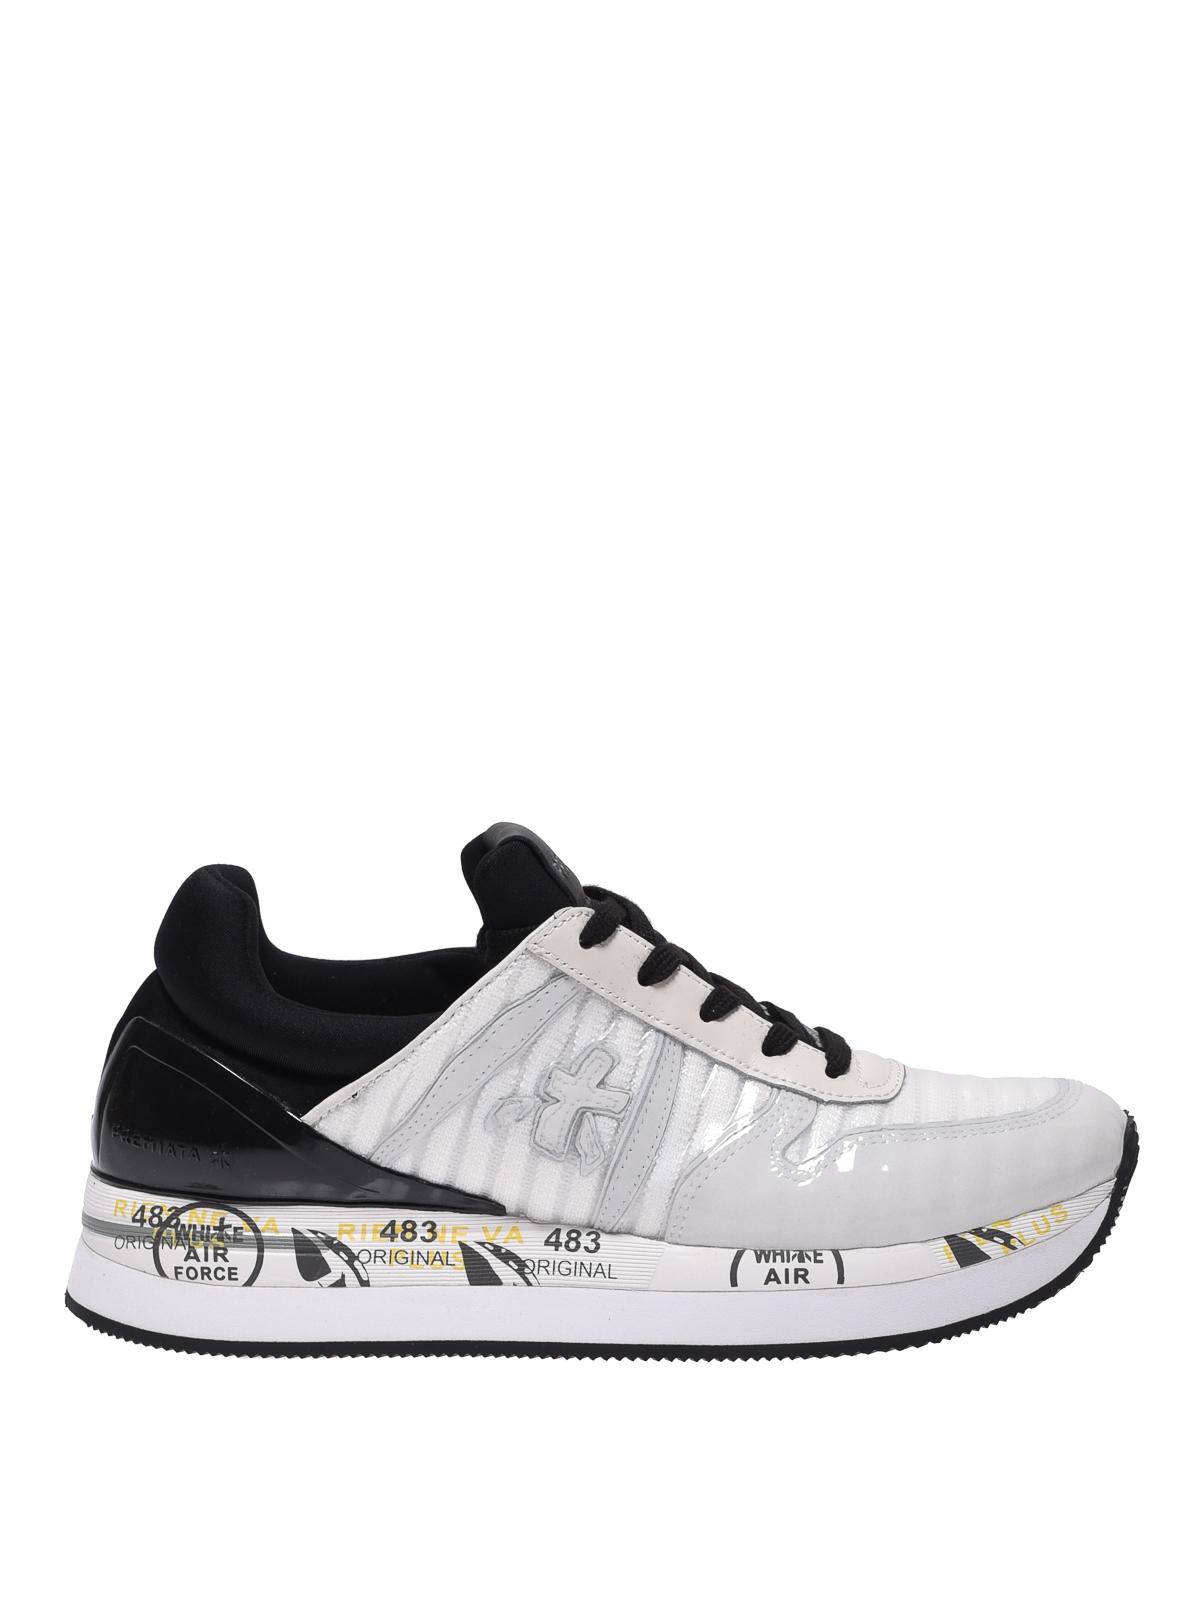 Sneakers Premiata Leather Trainers Patent Liz 3235 wSxCSZAq